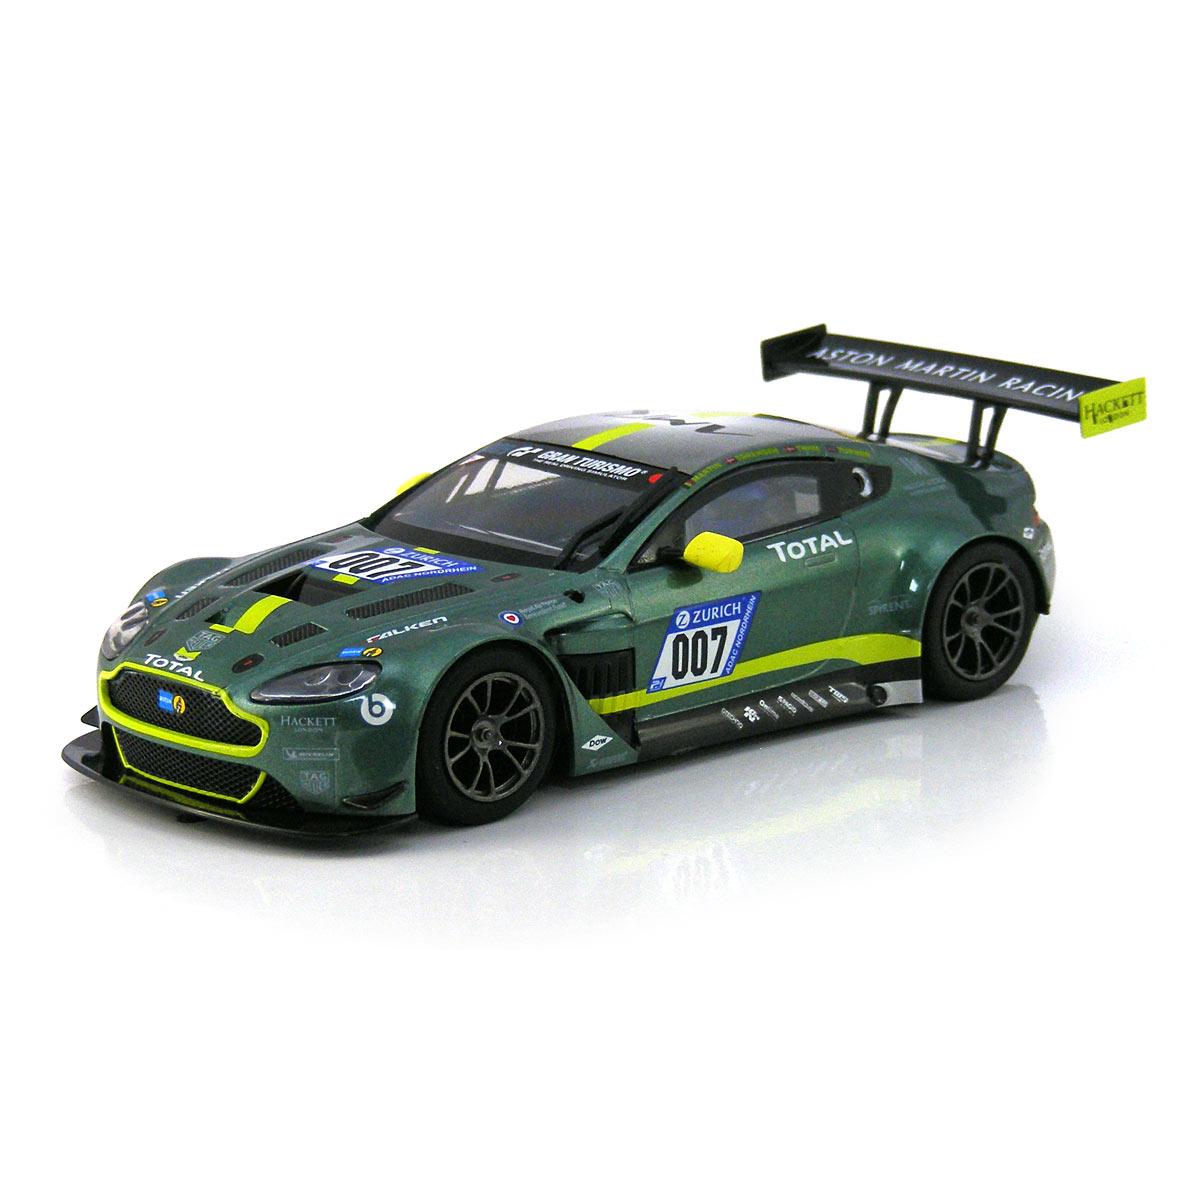 Scalextric Aston Martin GT3 Nurburgring 24hrs 2018 (C4036